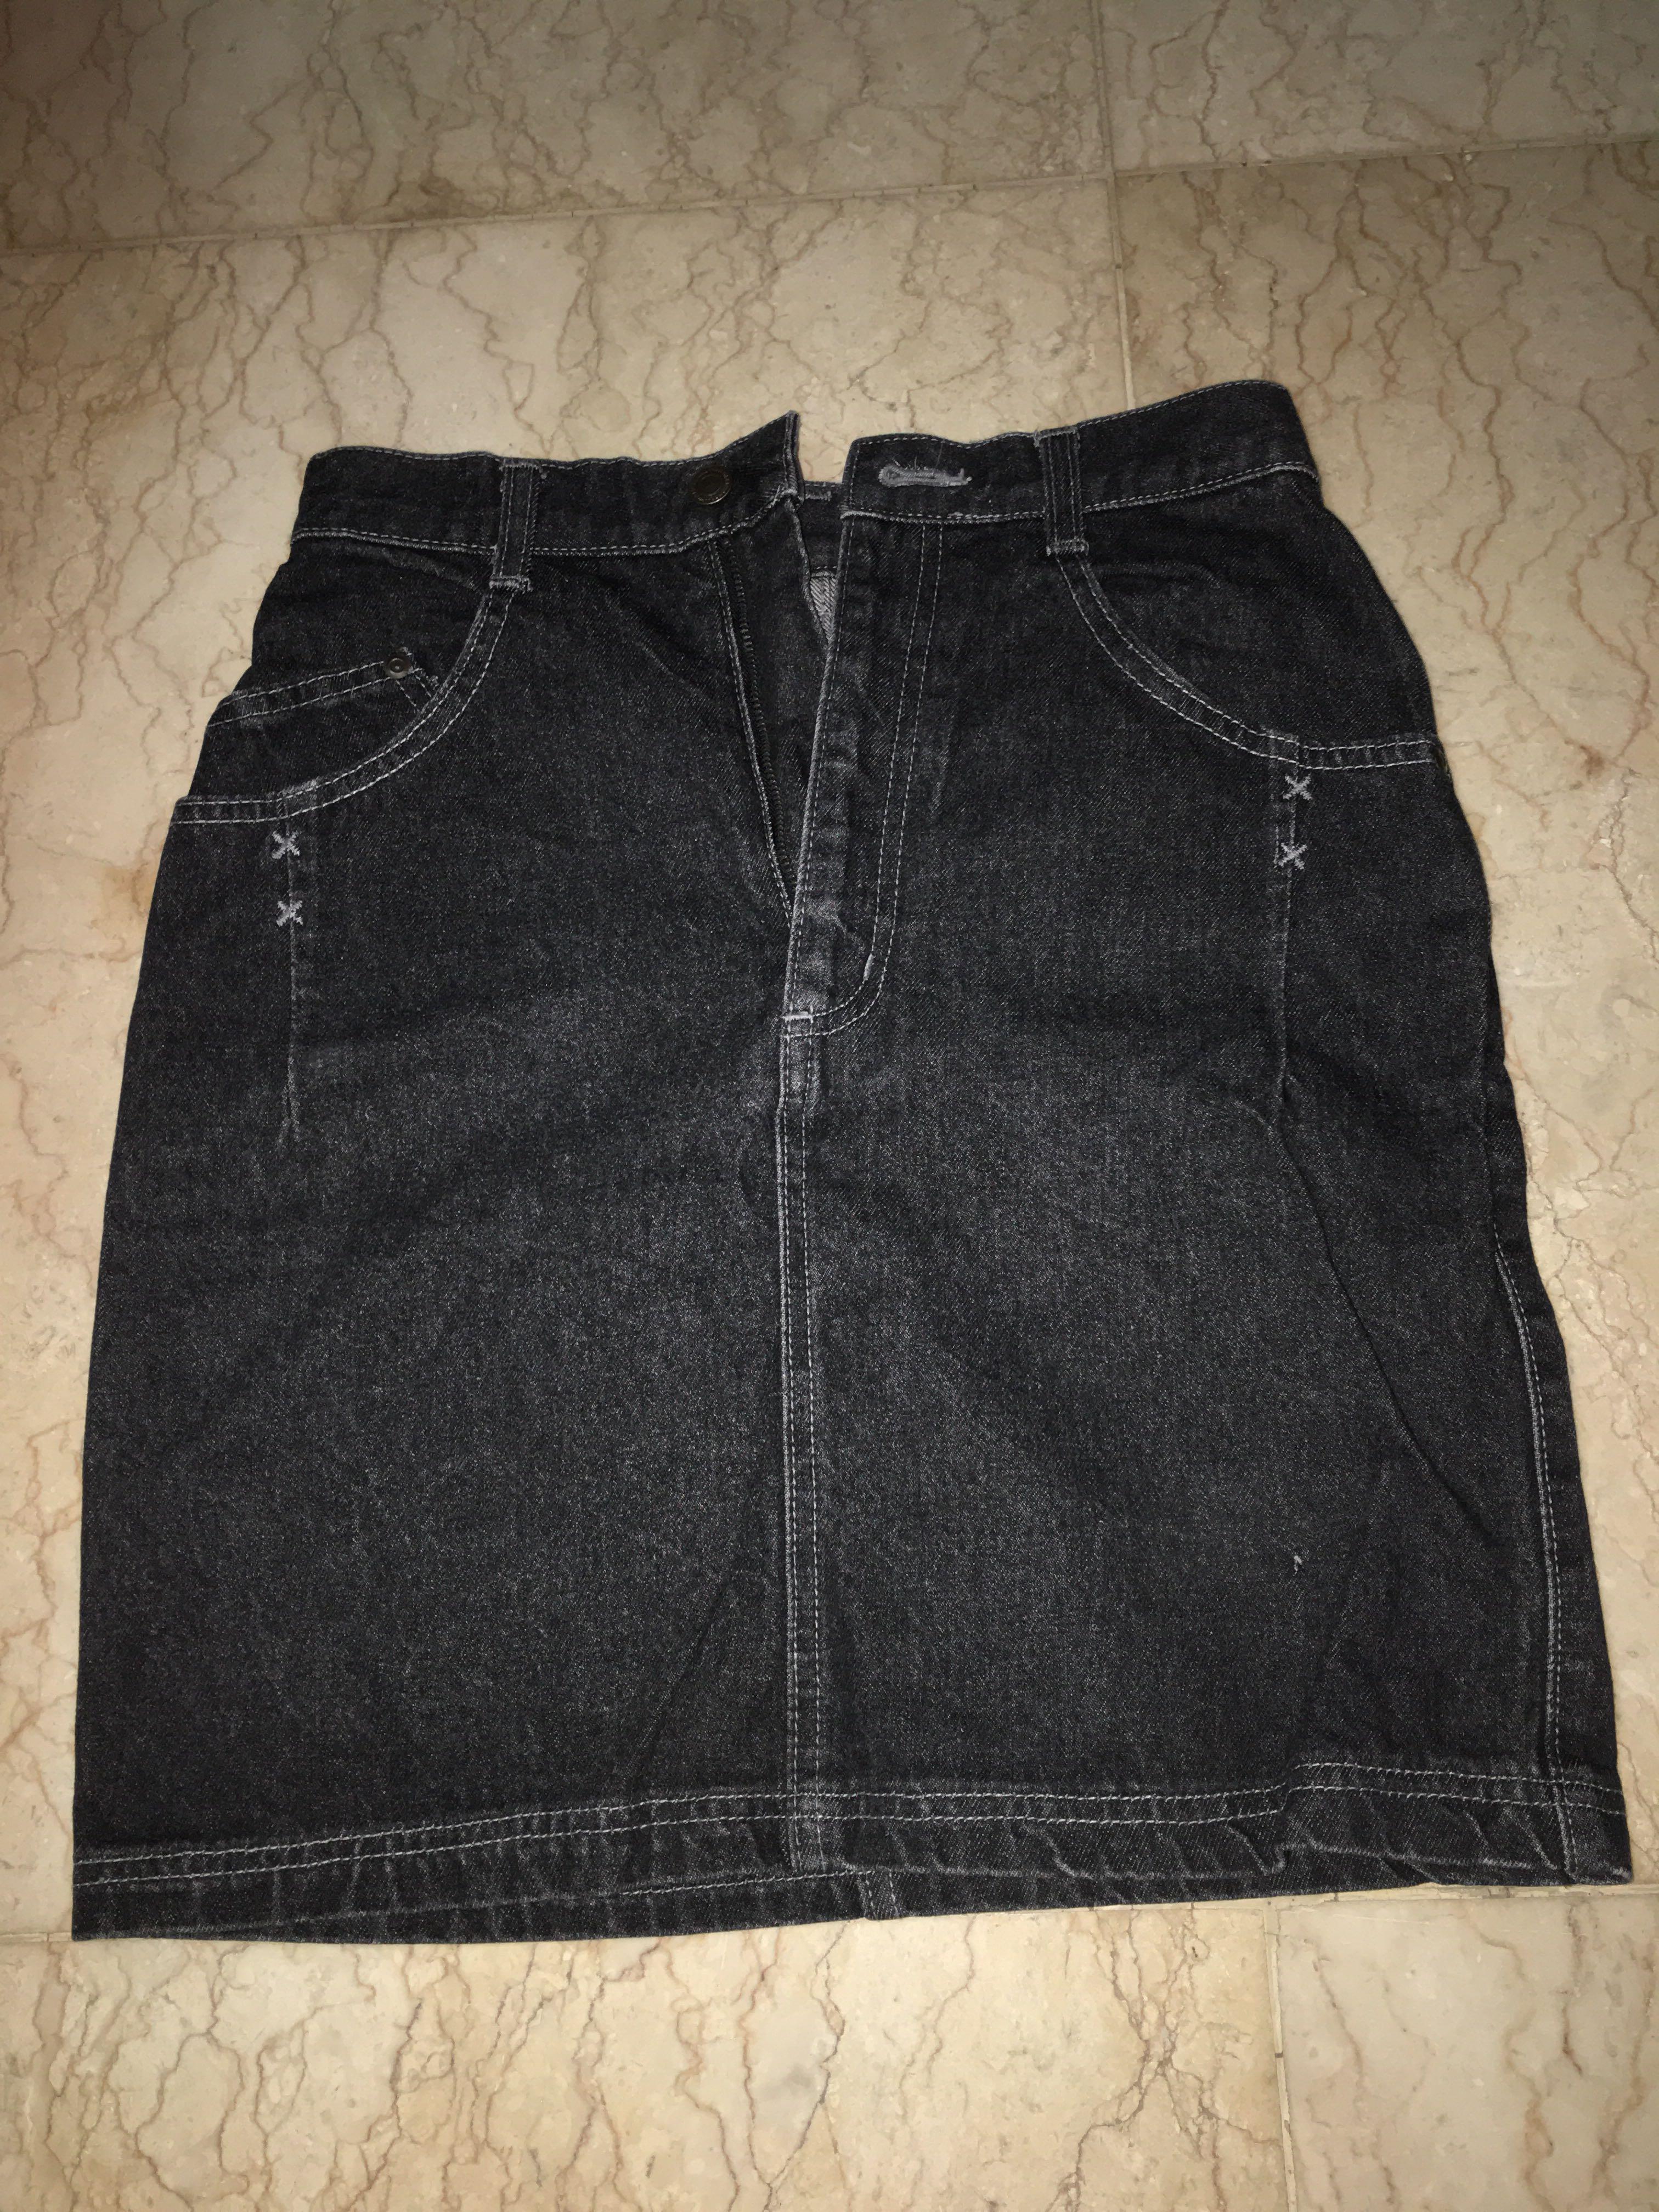 Rok Jeans Hitam Span